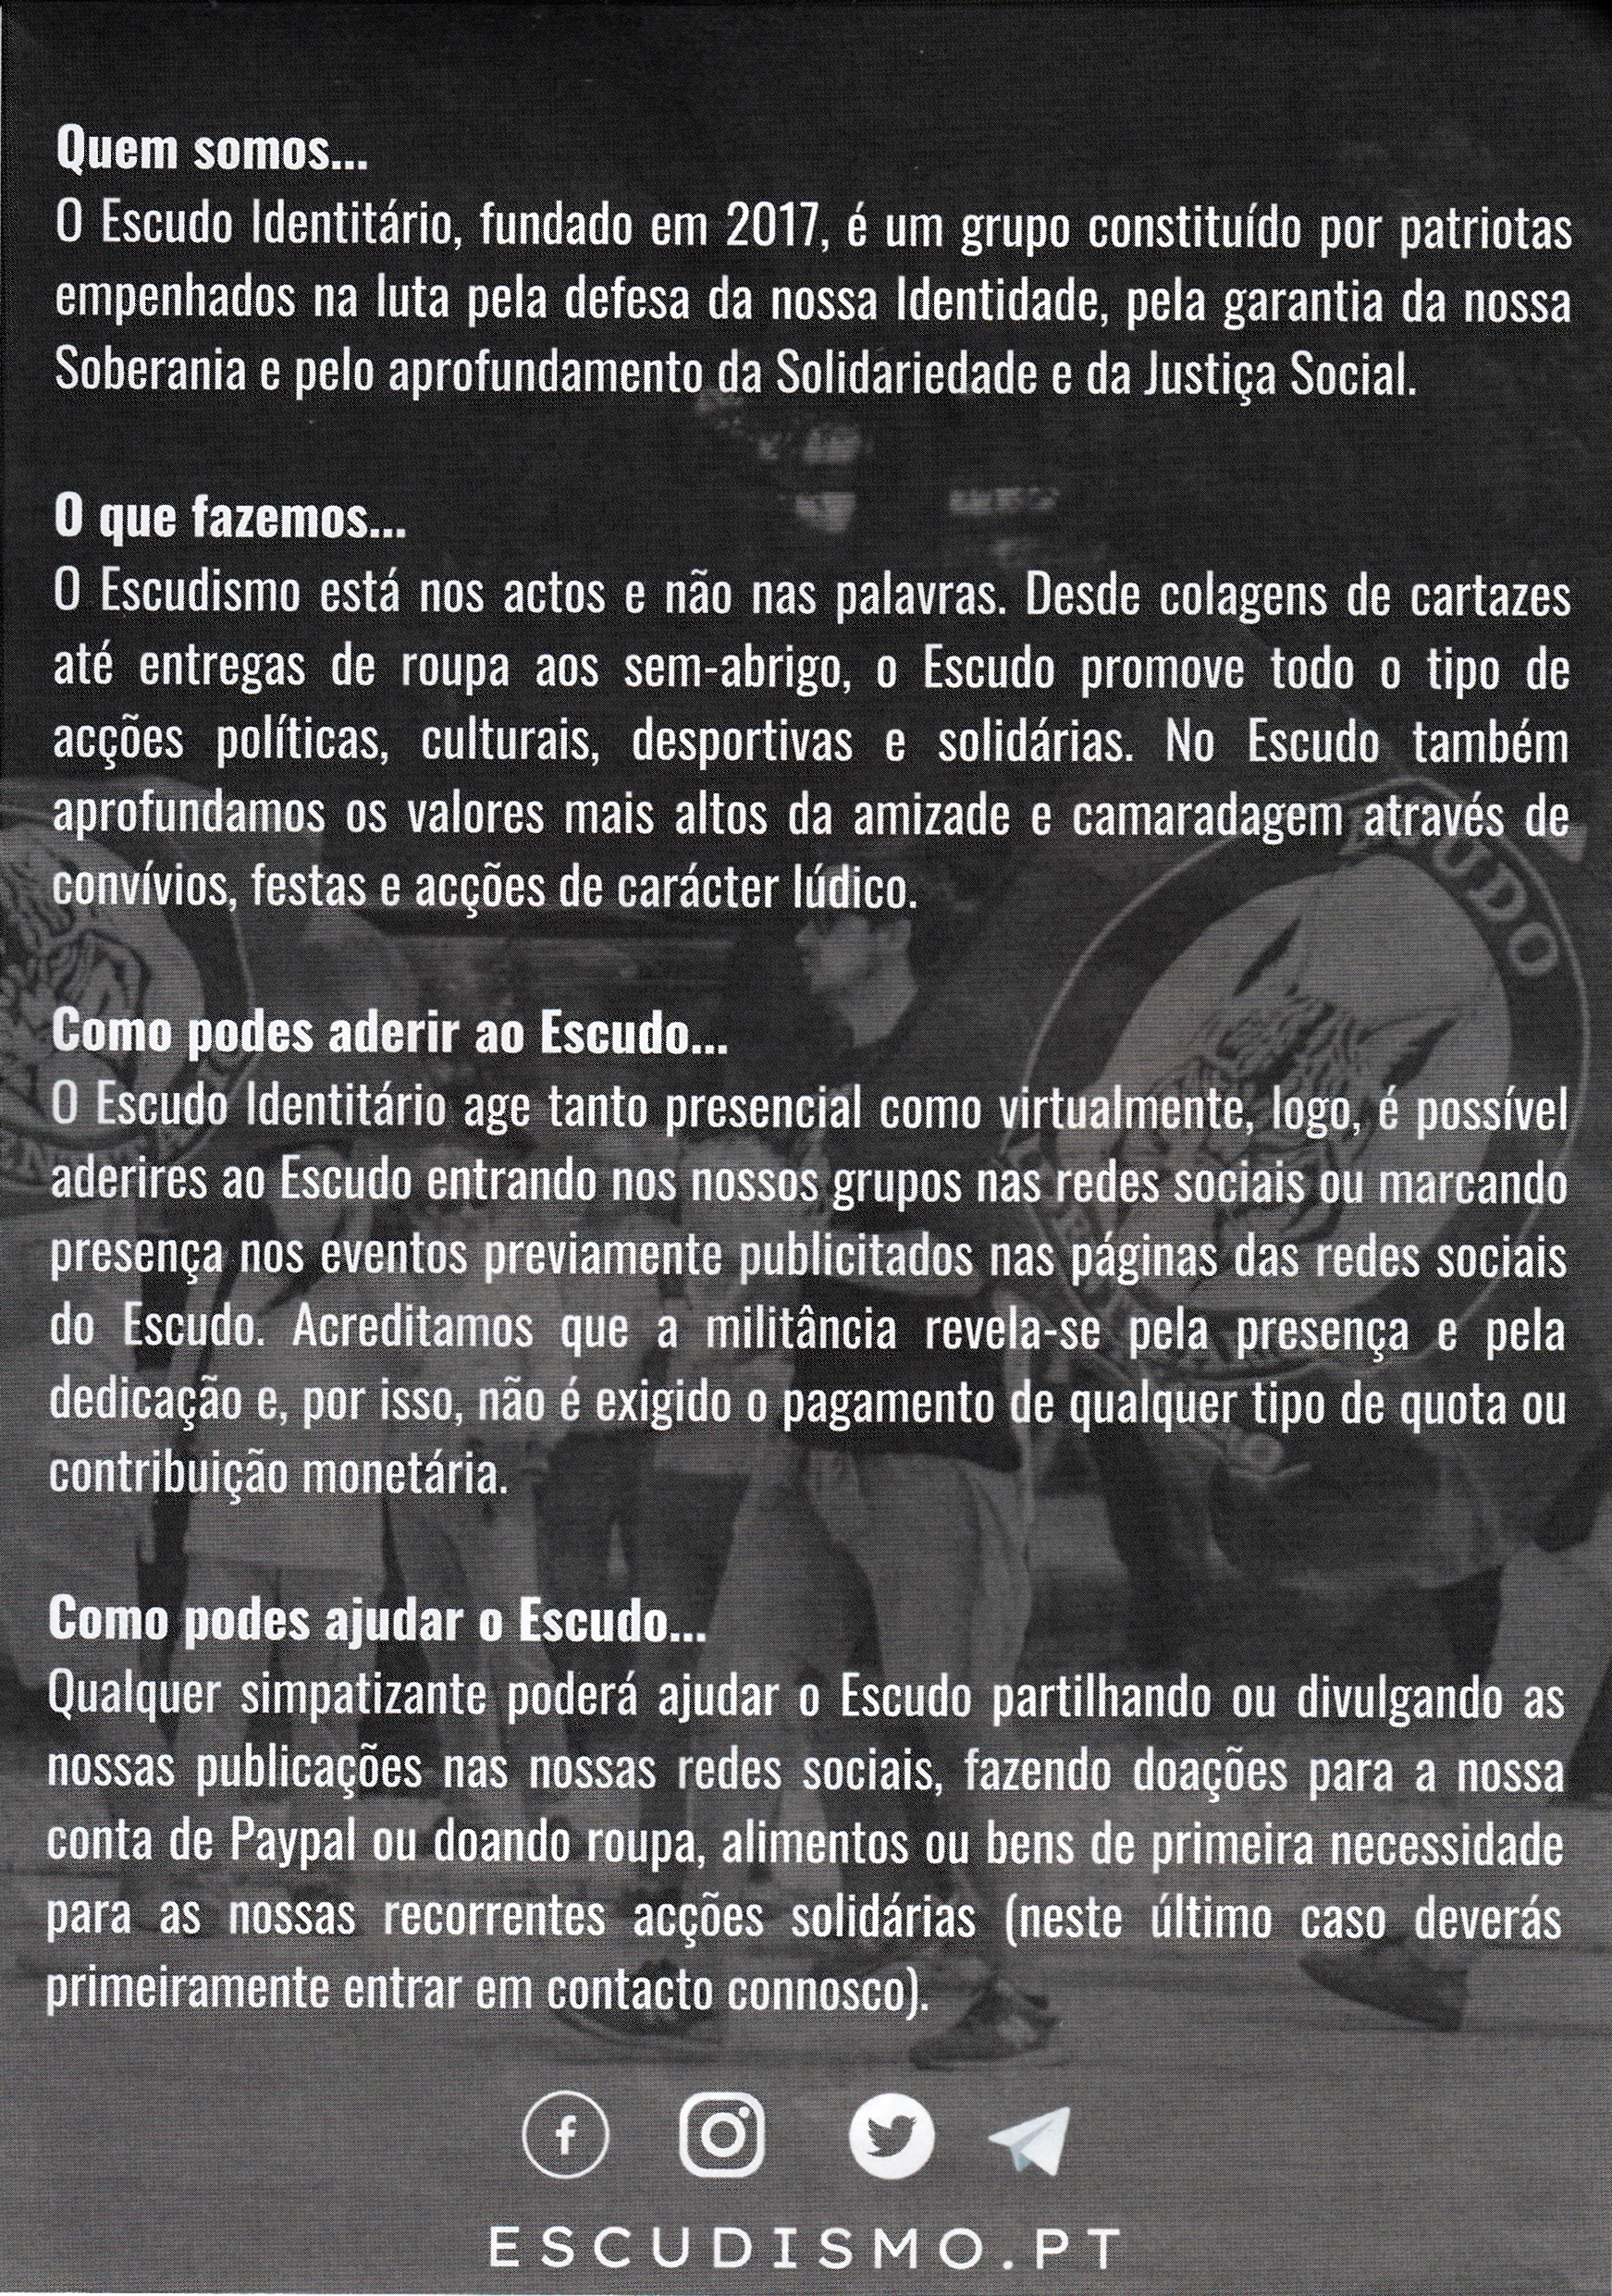 Escudo_Identitario_2021_panfleto_0002